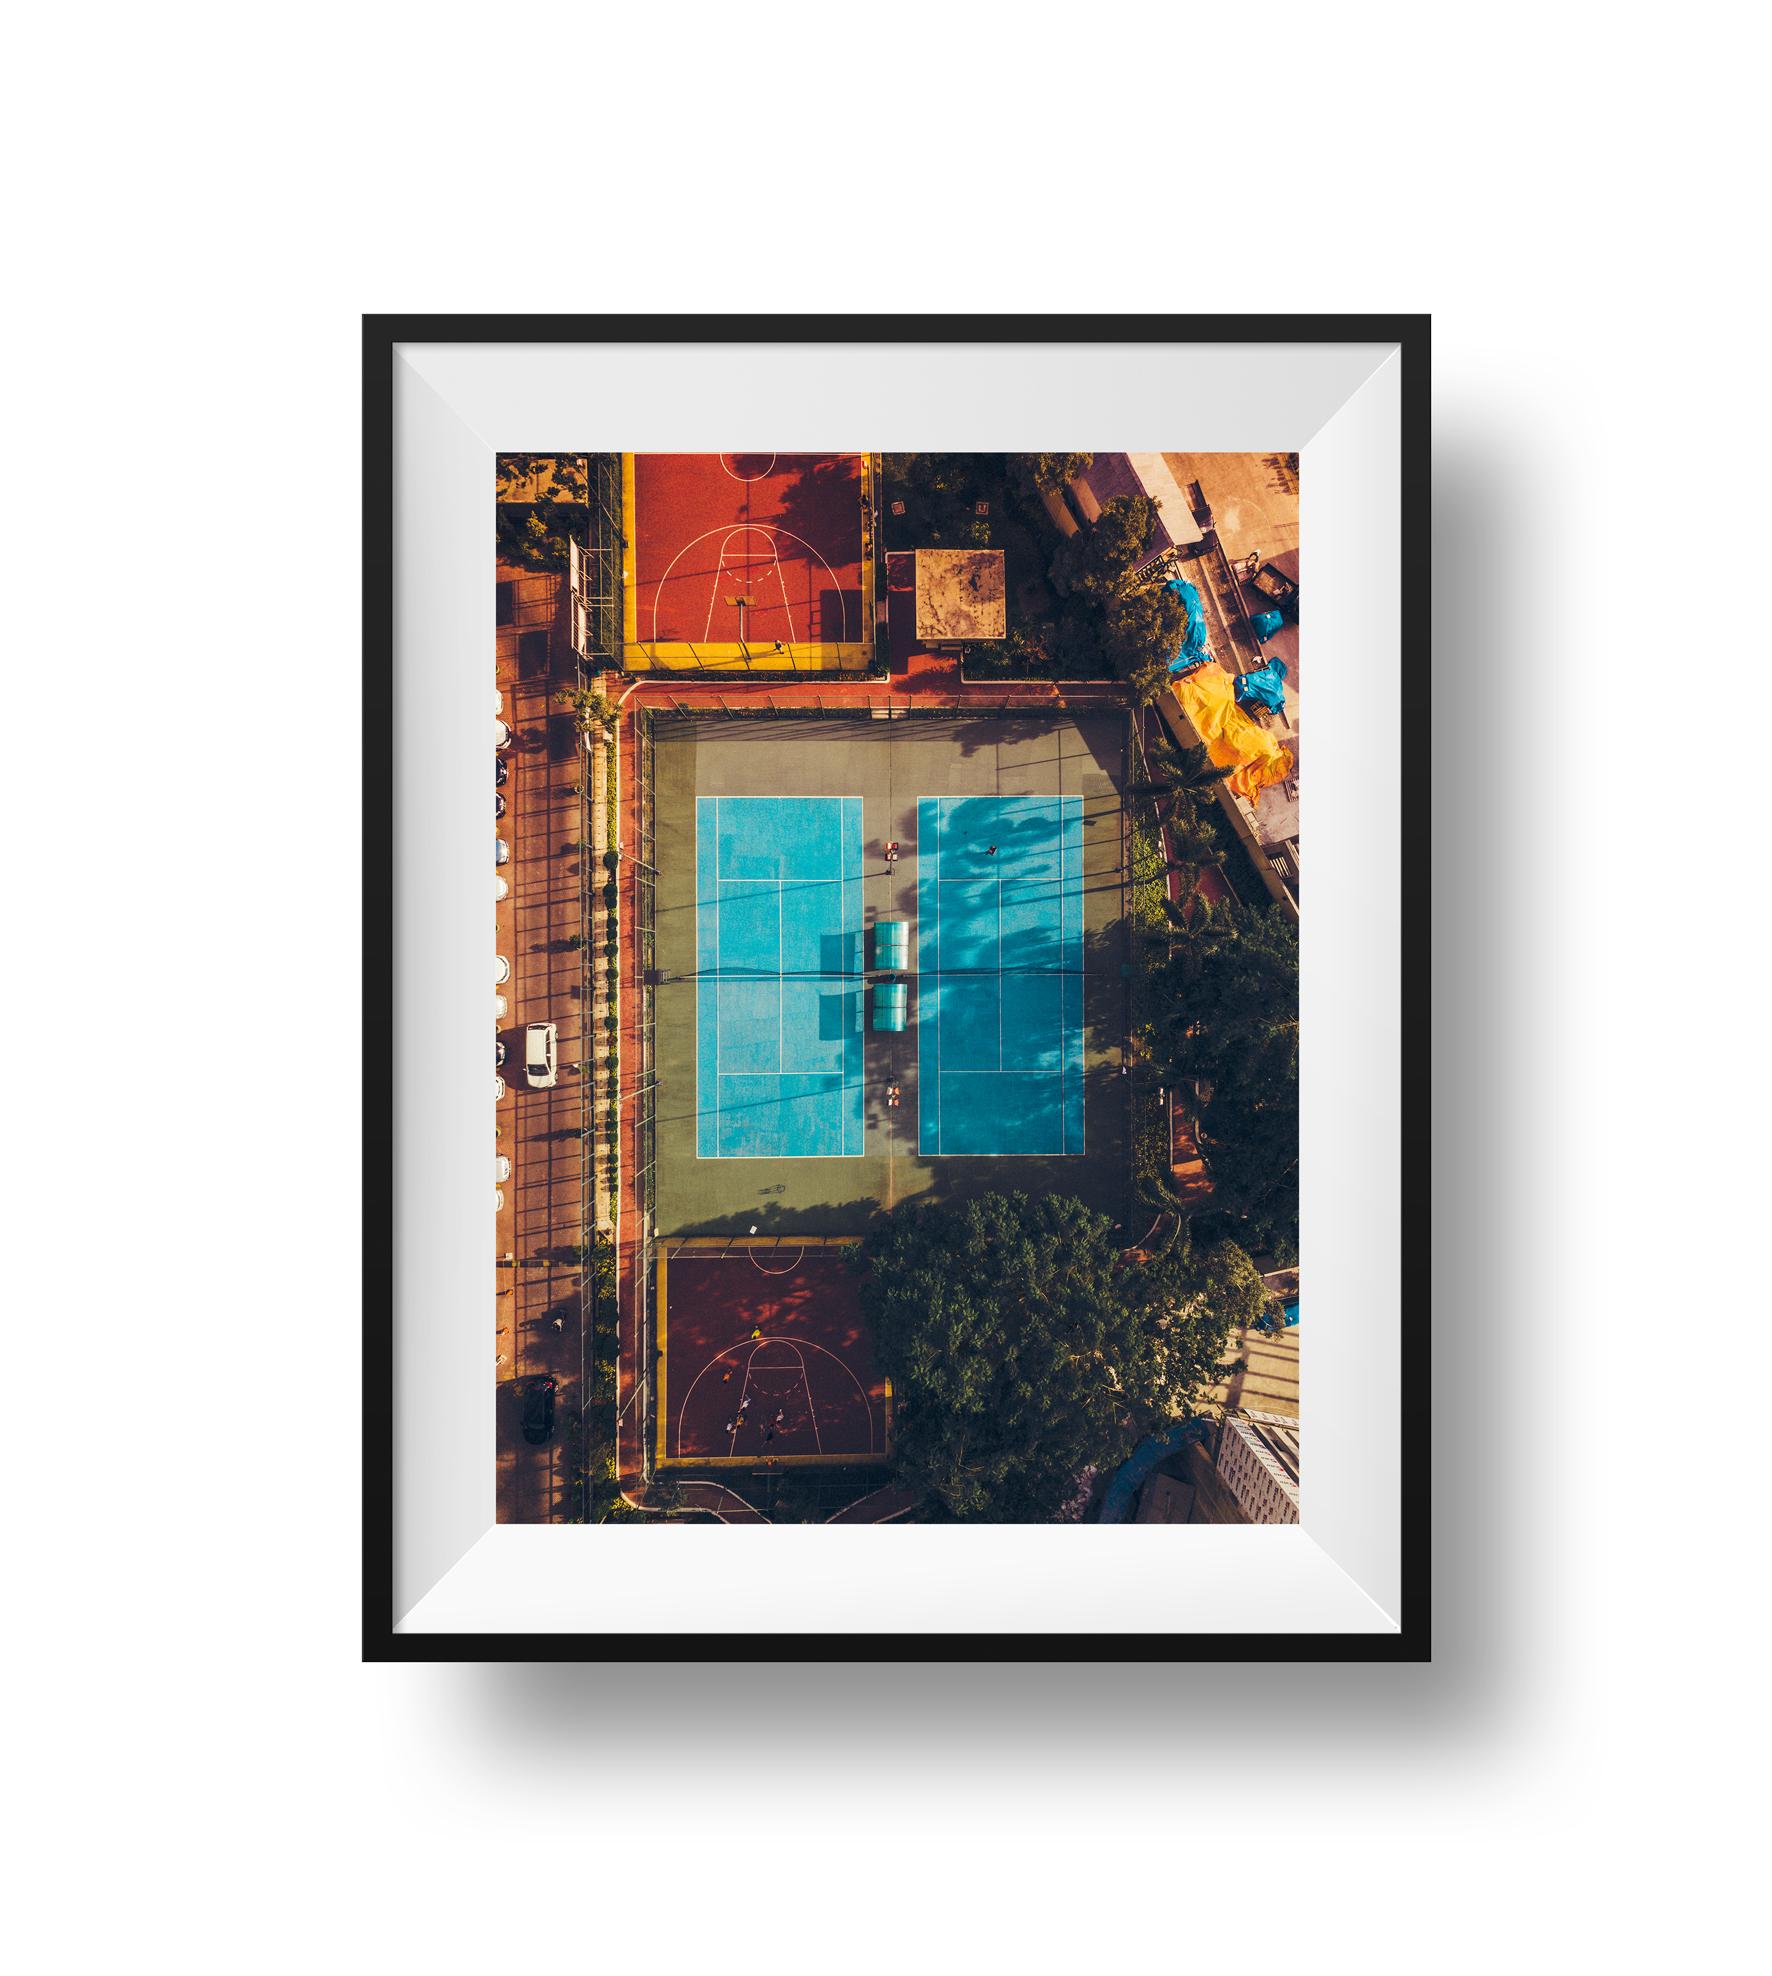 Jakarta Courtyard